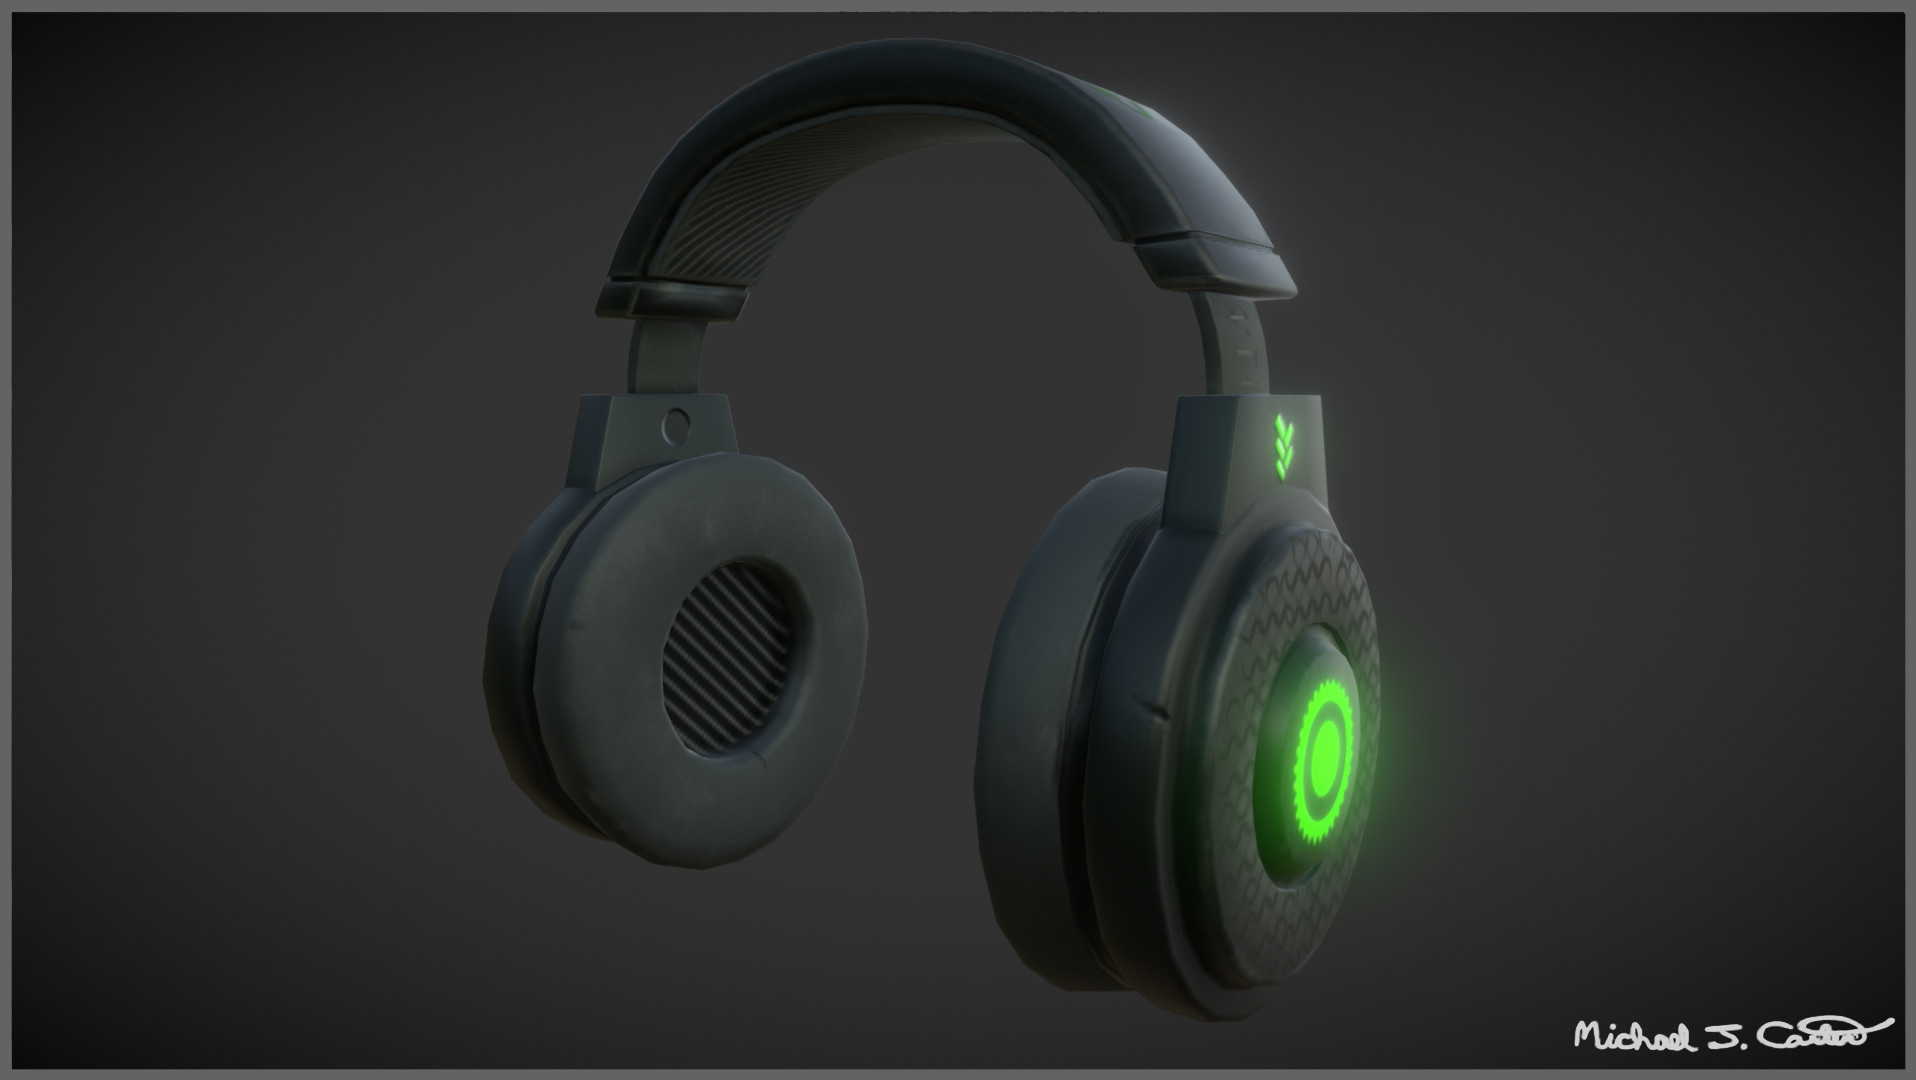 Michael jake carter mcarter headset right side image